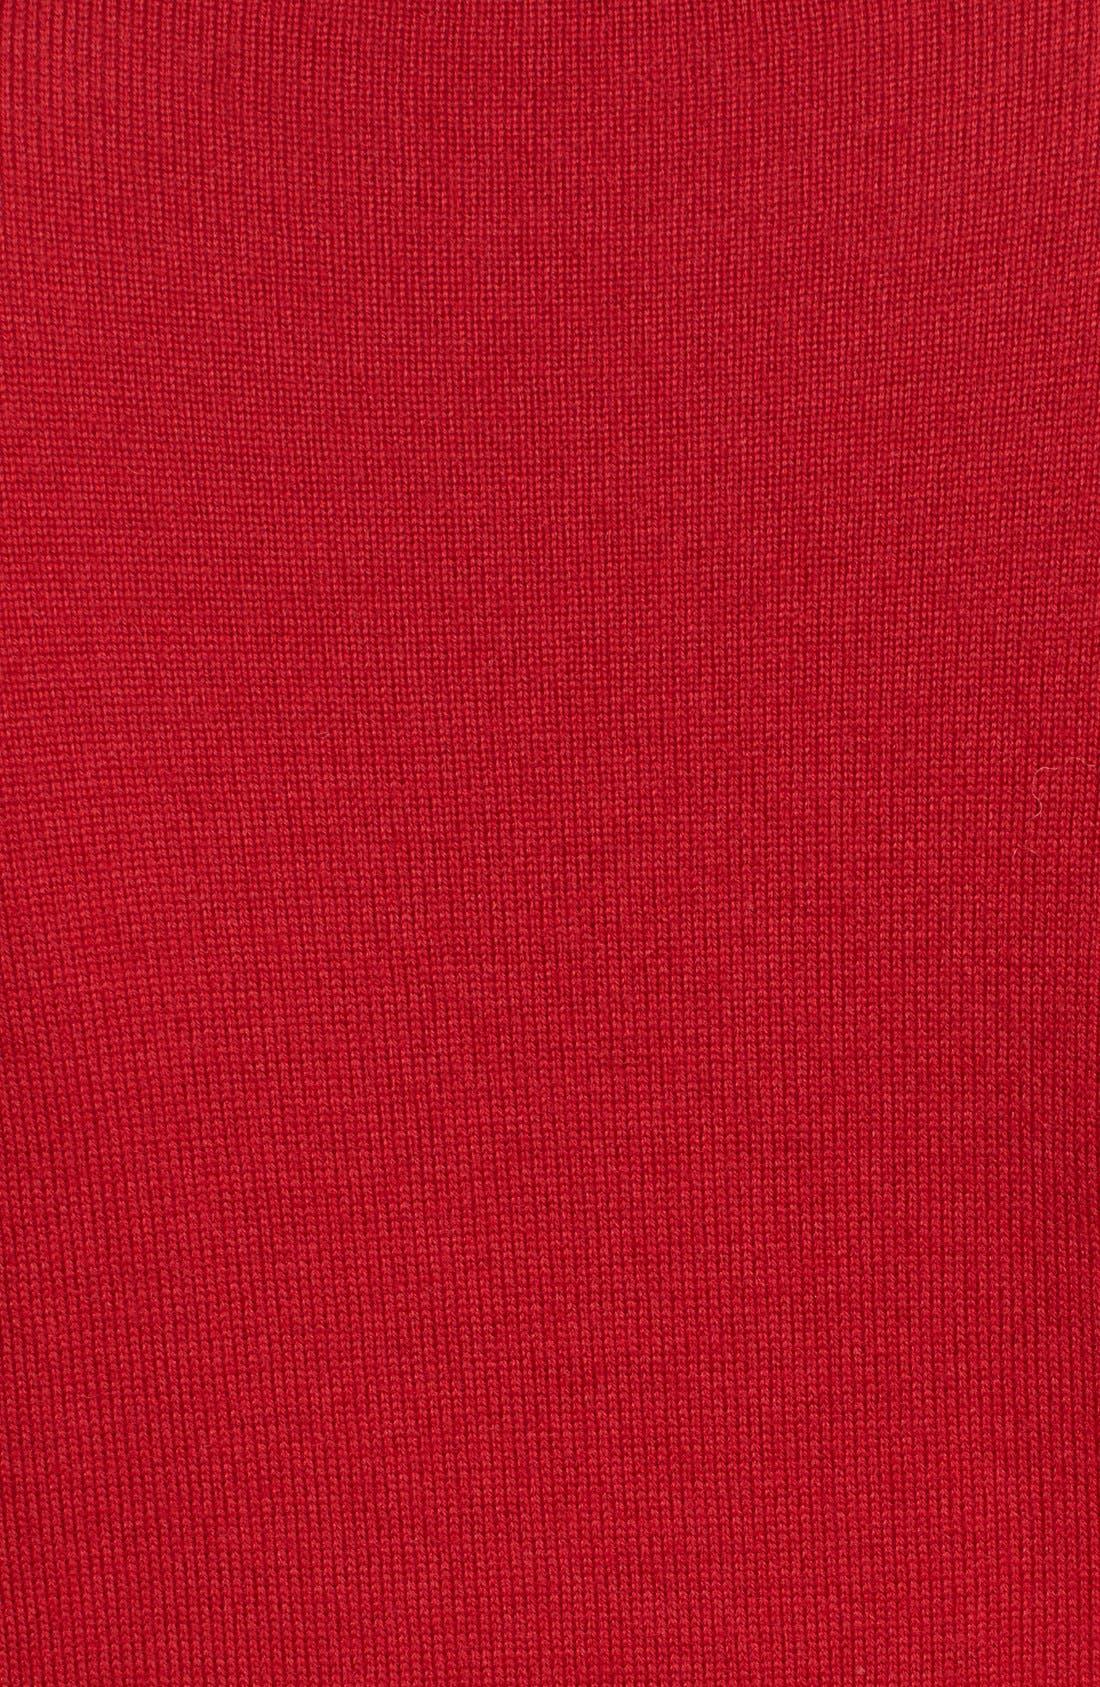 Alternate Image 3  - Bella Freud 'Star Studded' Crewneck Wool Sweater